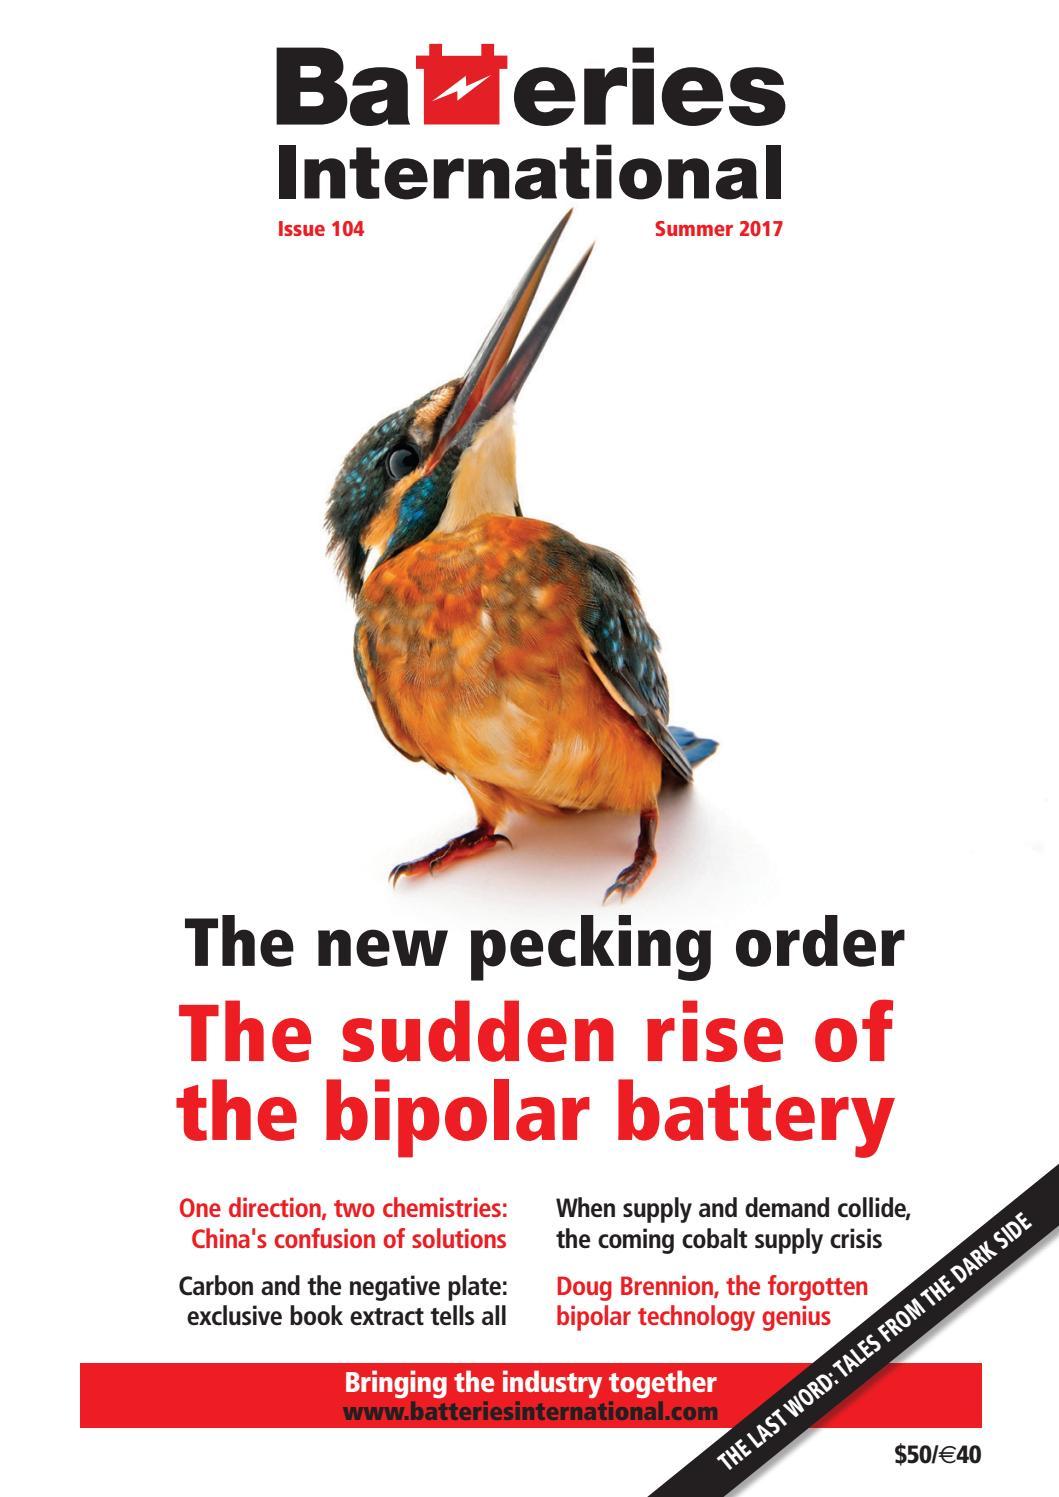 Batteries International Magazine 104 Issue By Hamptonhalls Issuu Bipolar Input Long Term Integrator